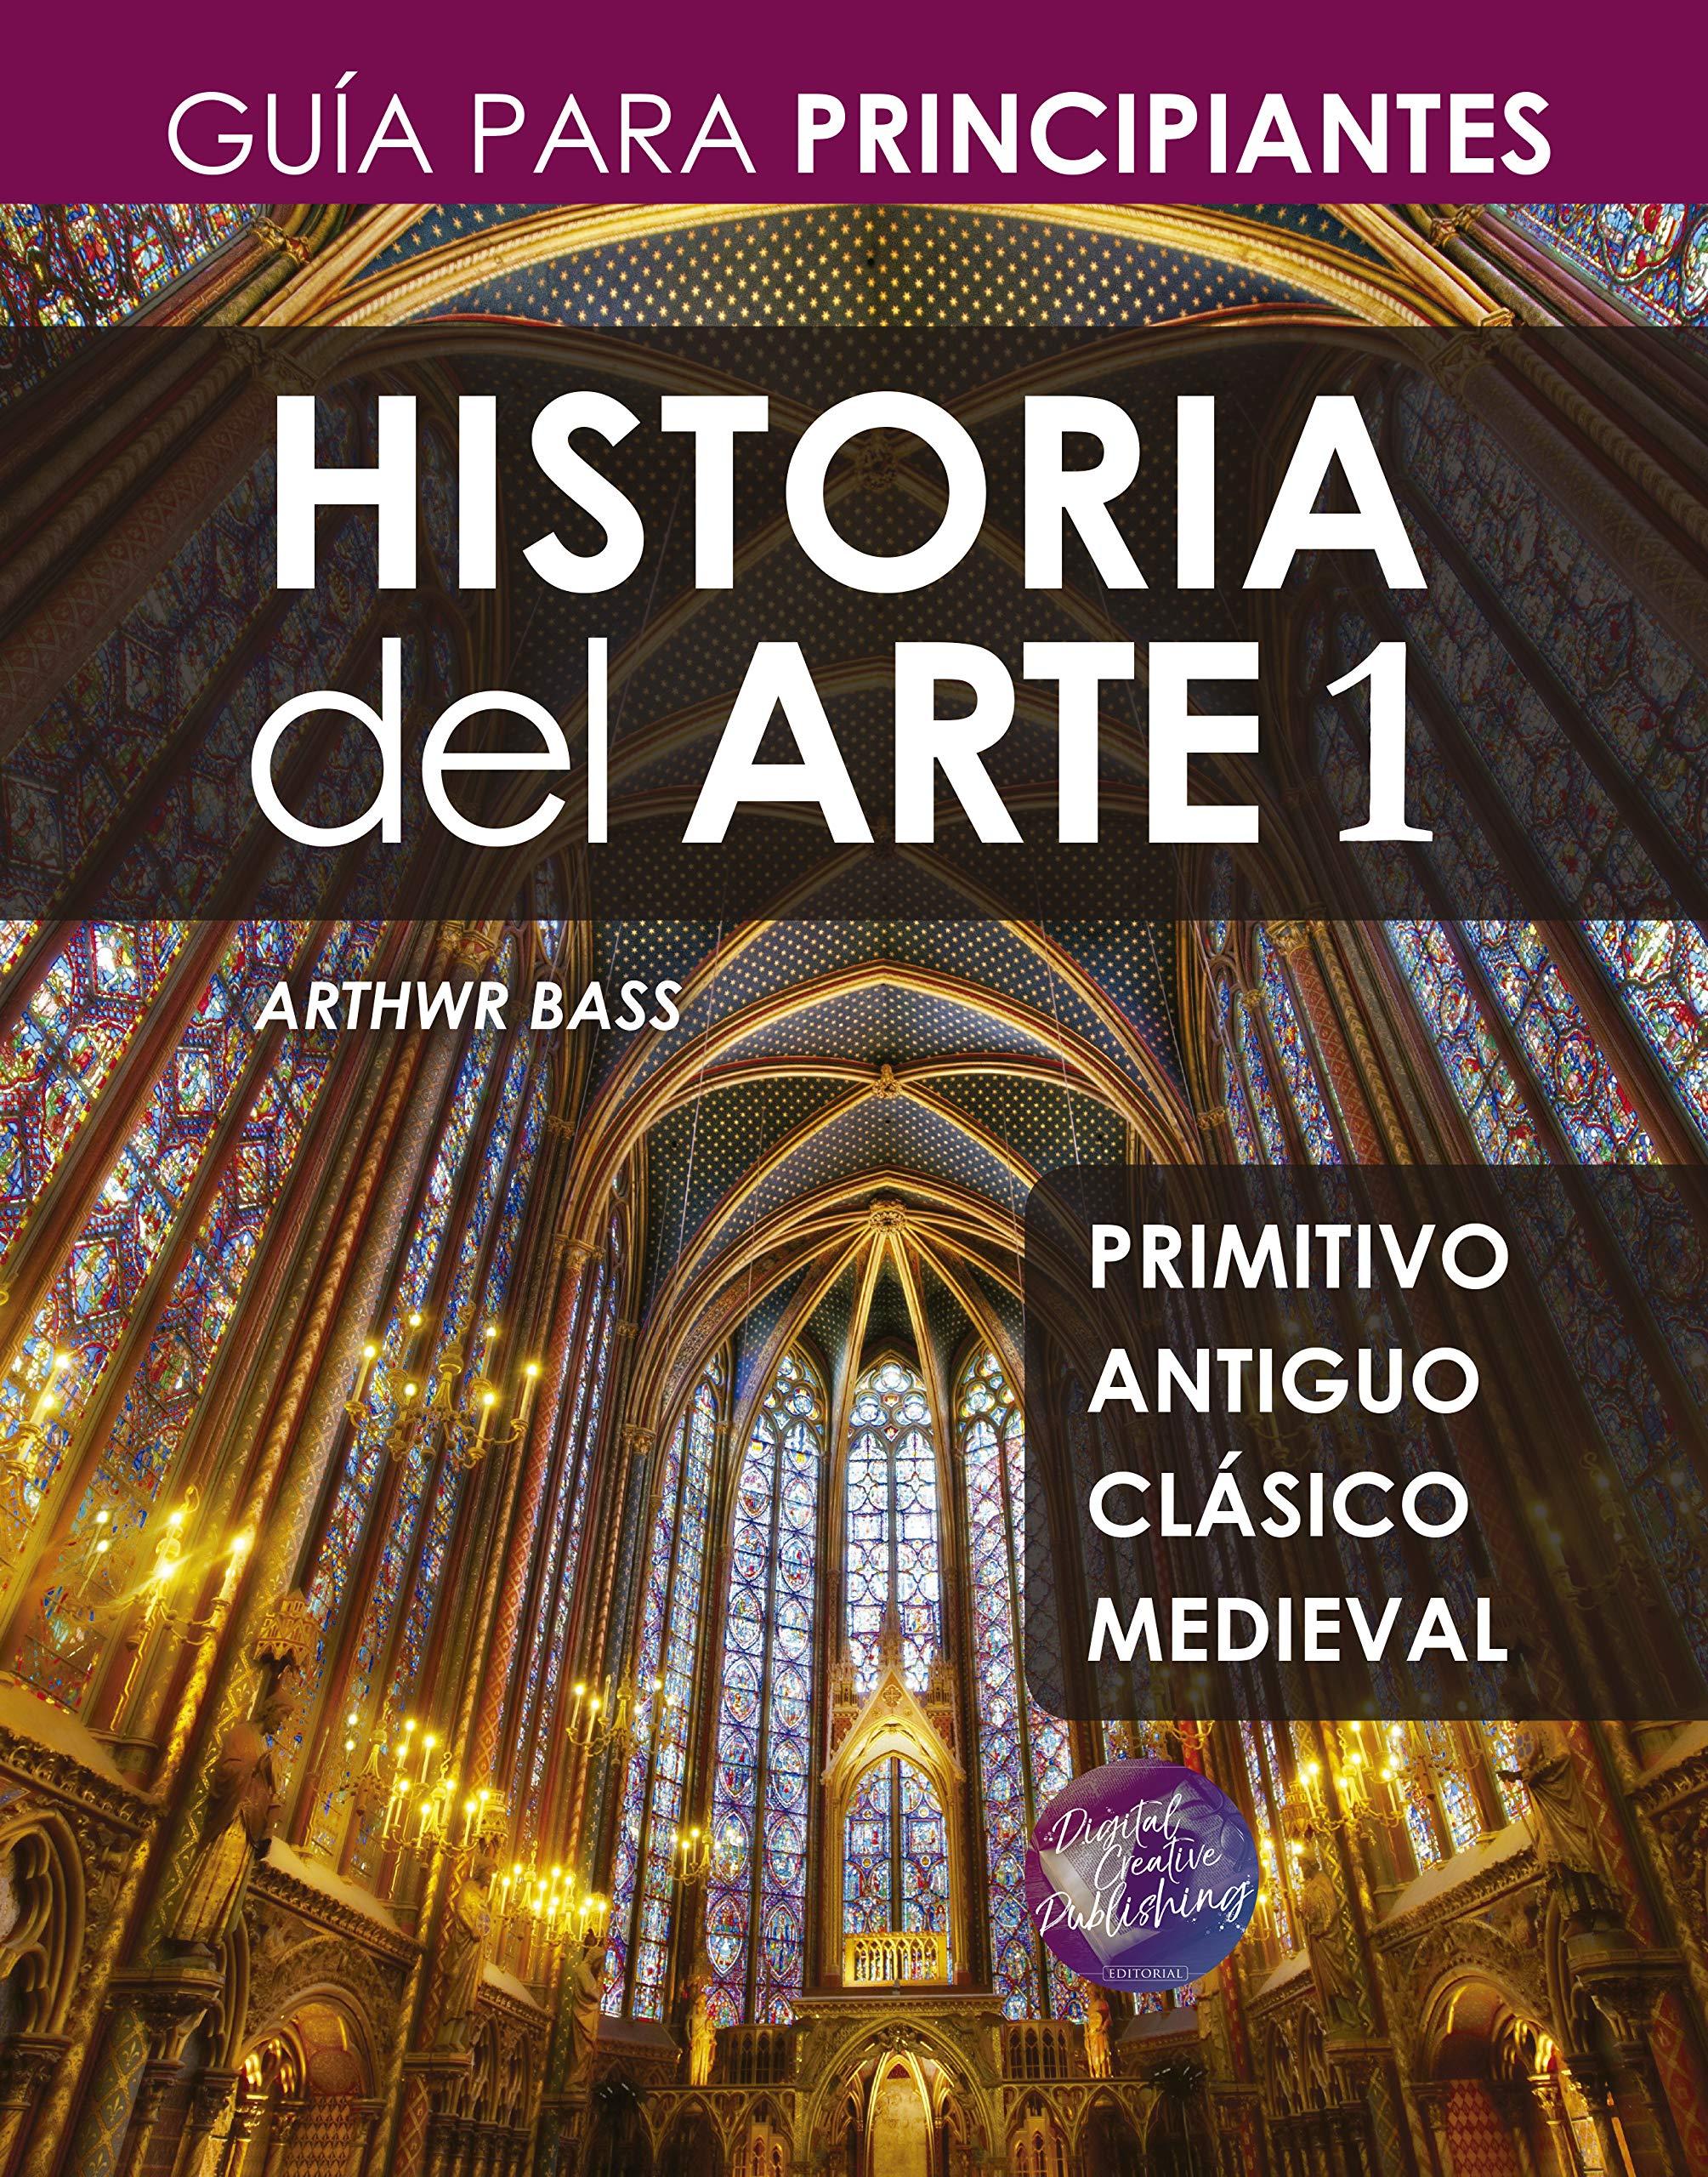 Historia del Arte 1: Guía para Principiantes por Arthwr Bass